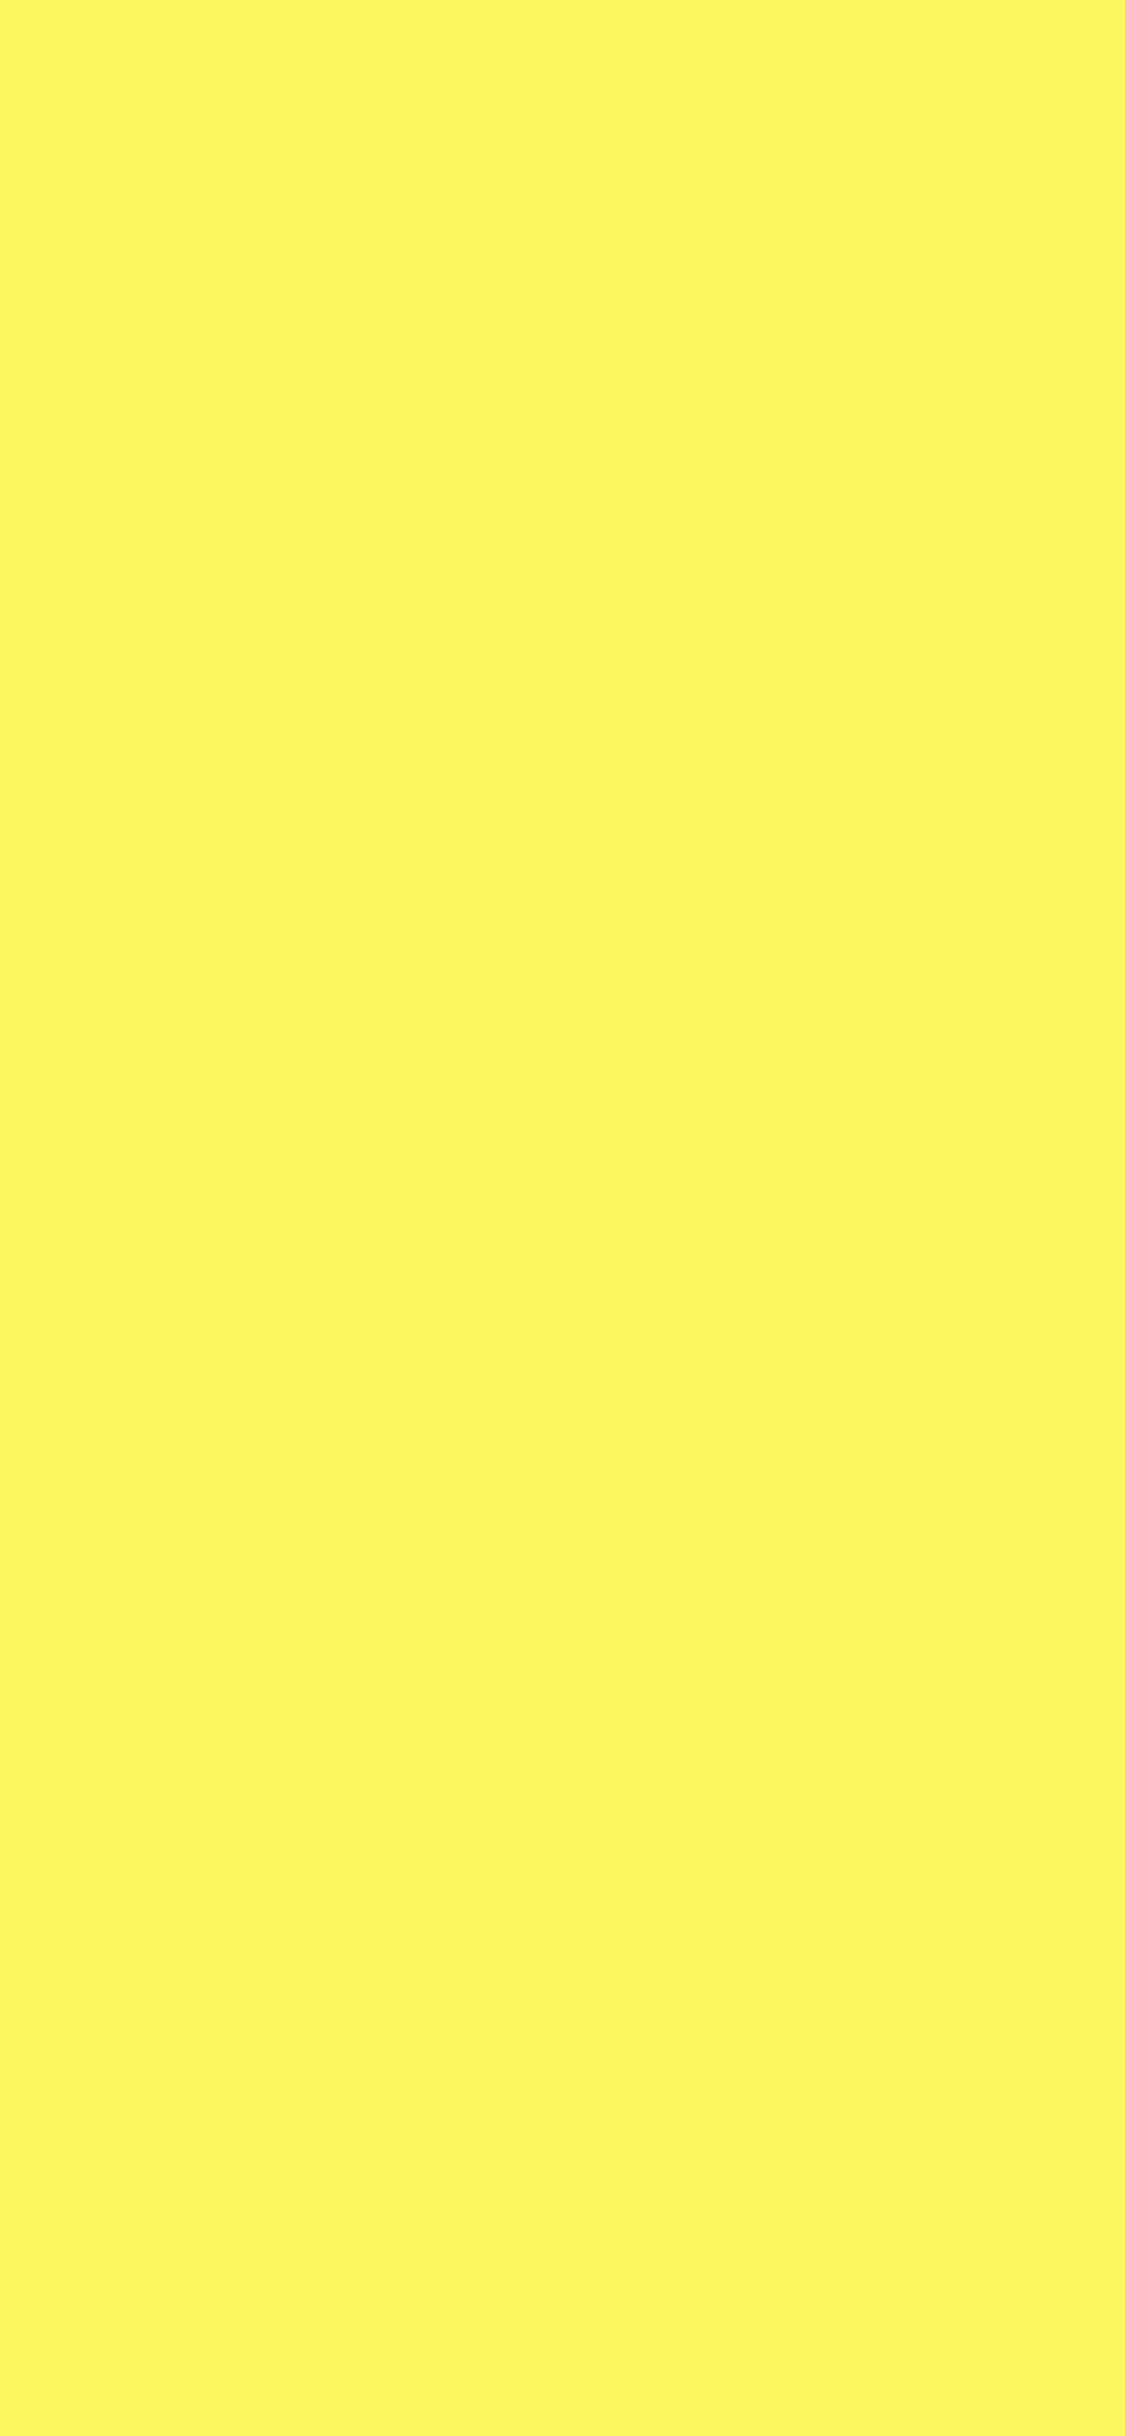 1125x2436 Icterine Solid Color Background